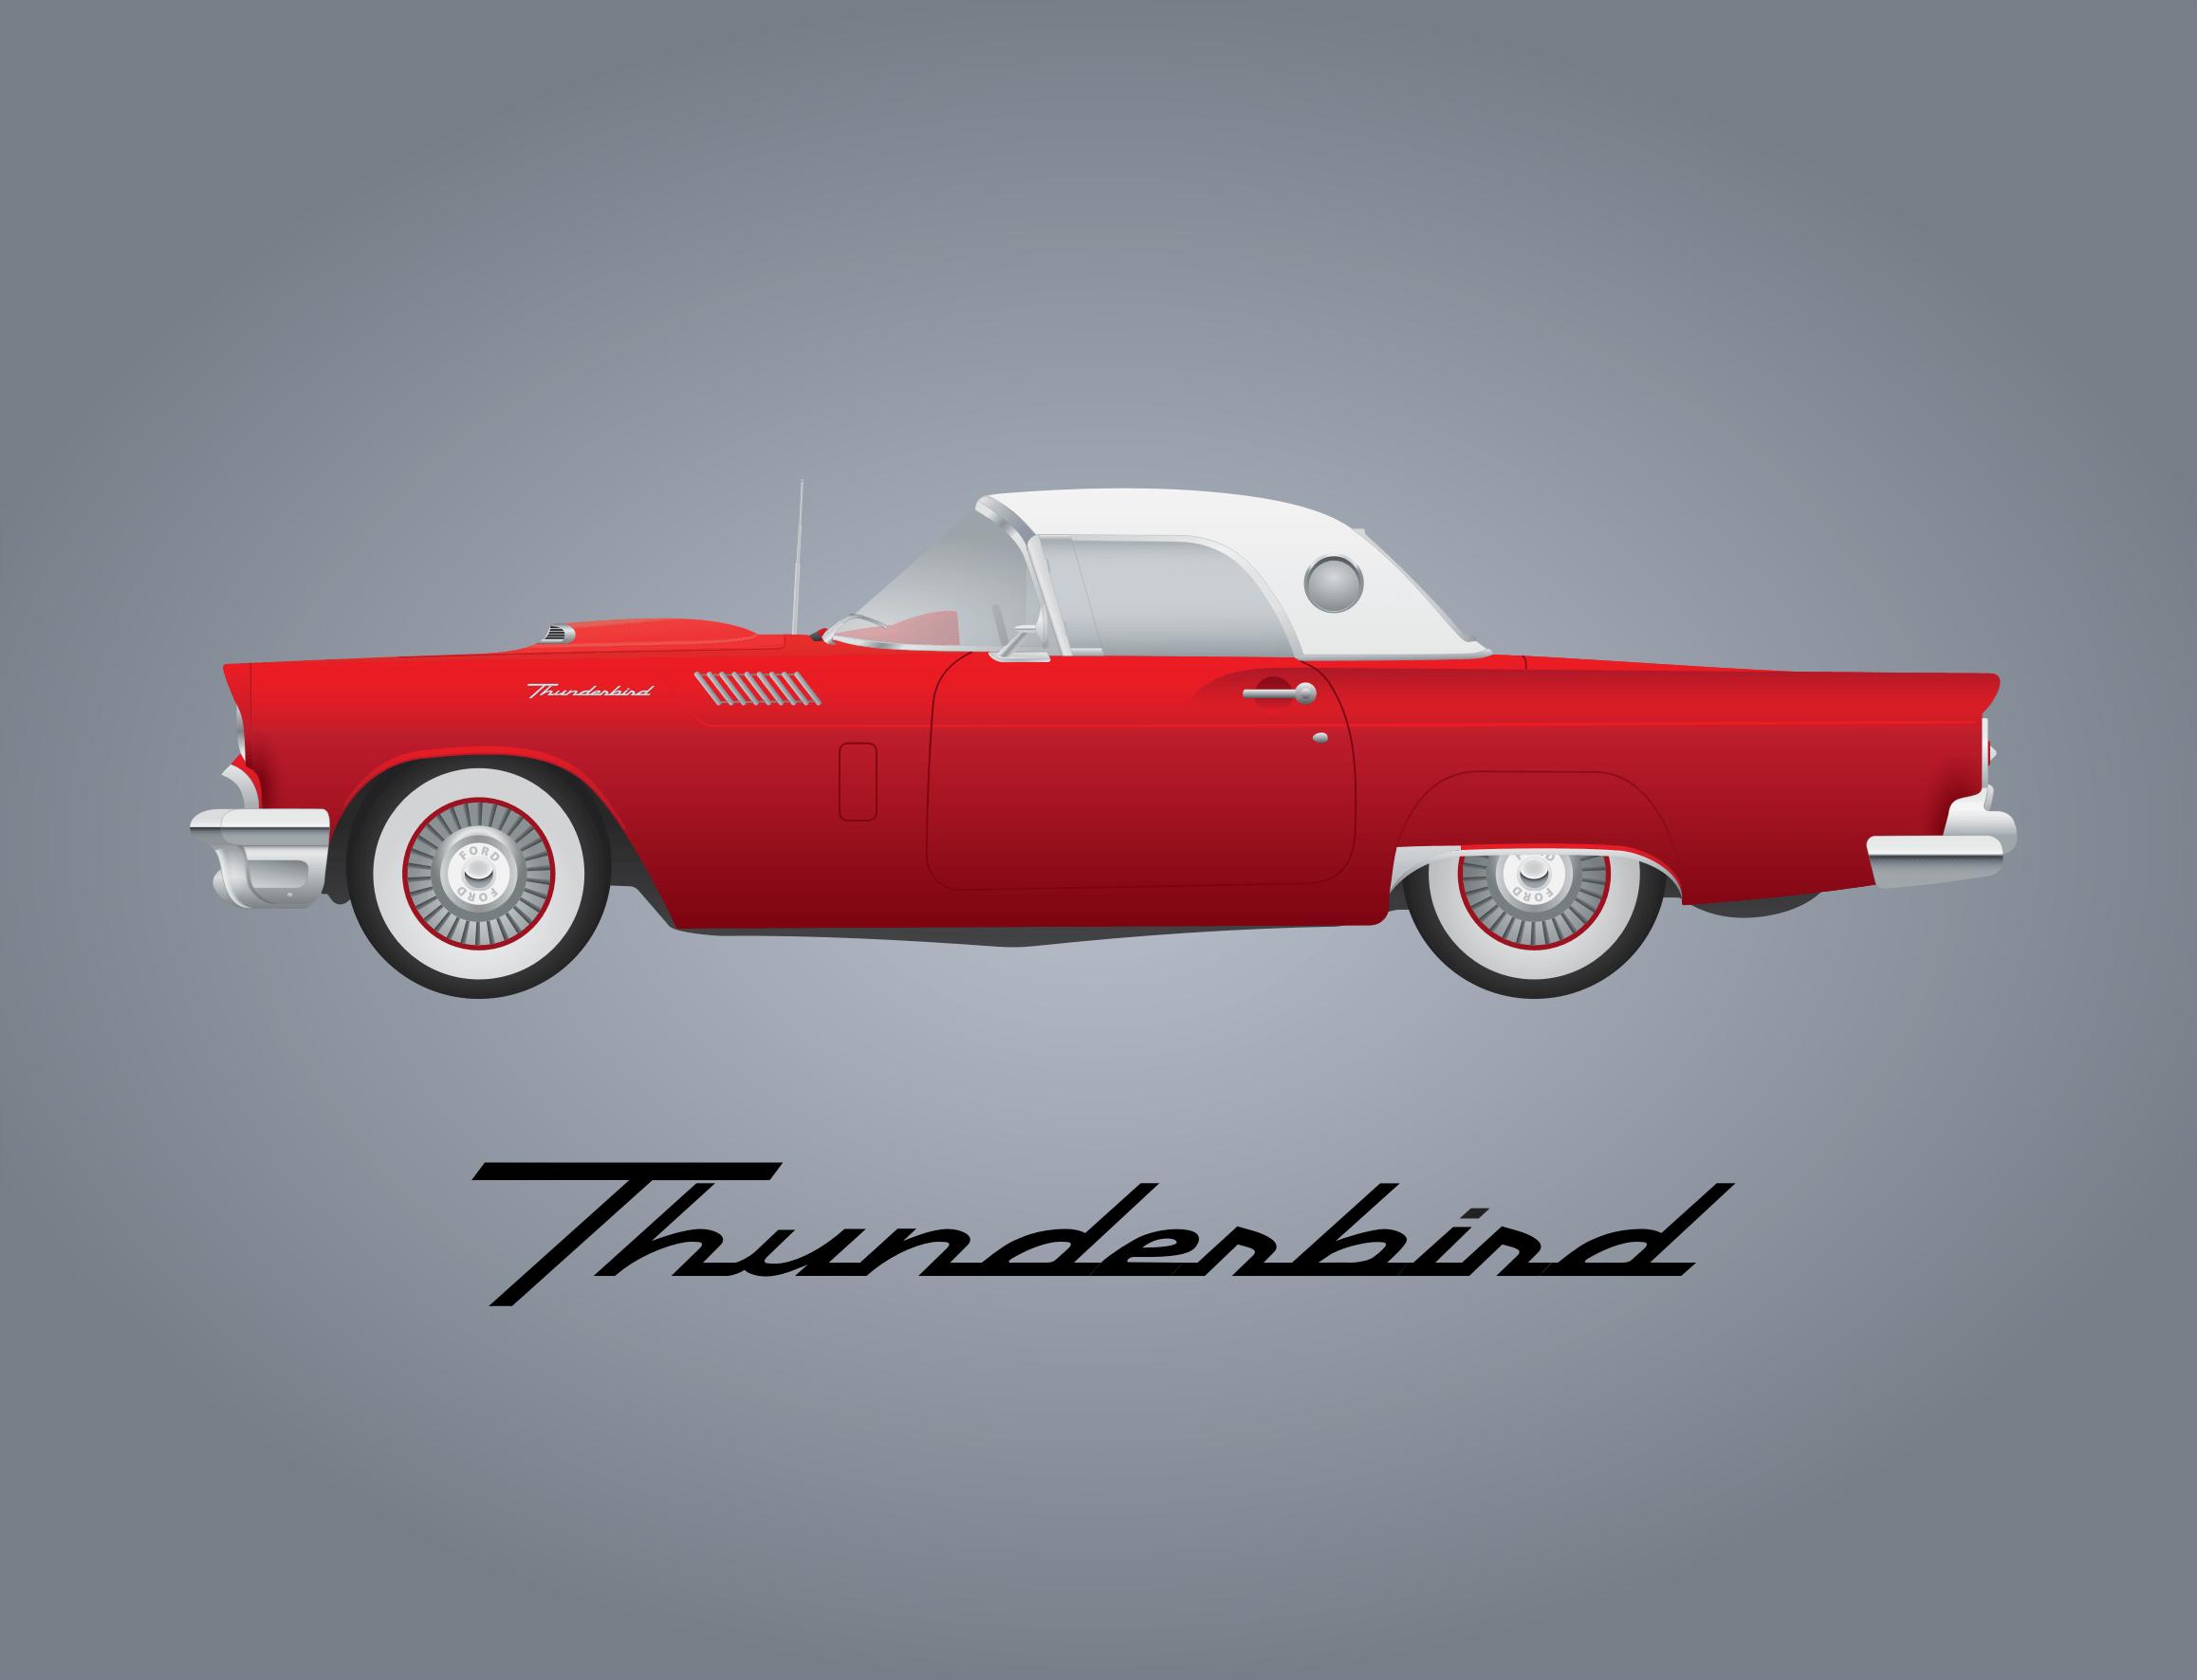 1956 t-bird clipart vector transparent download Thunderbird Cliparts - Cliparts Zone vector transparent download